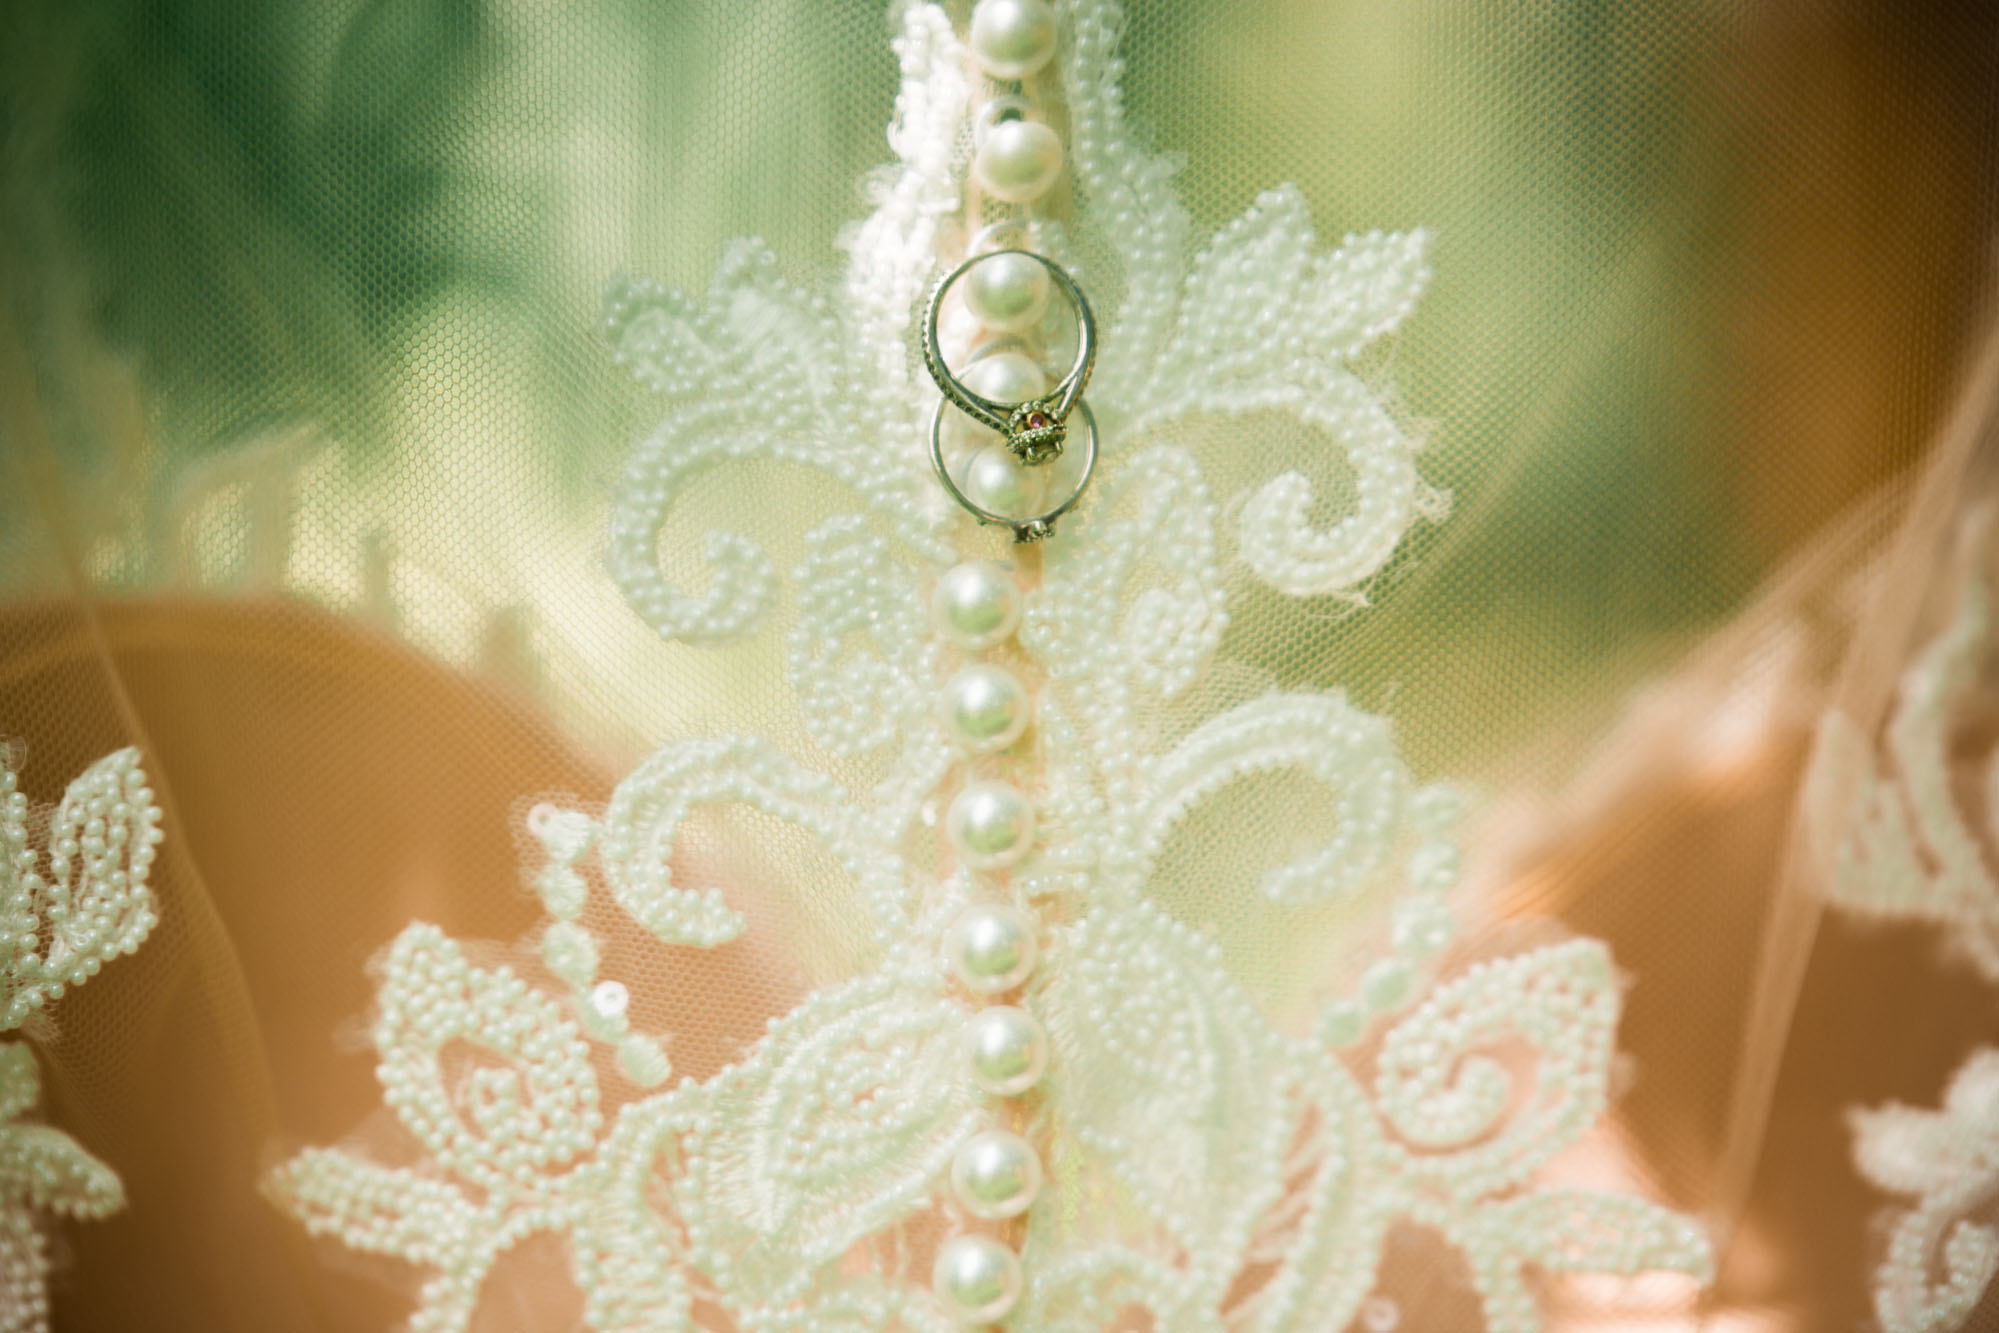 Calgary wedding photographer - wedding details